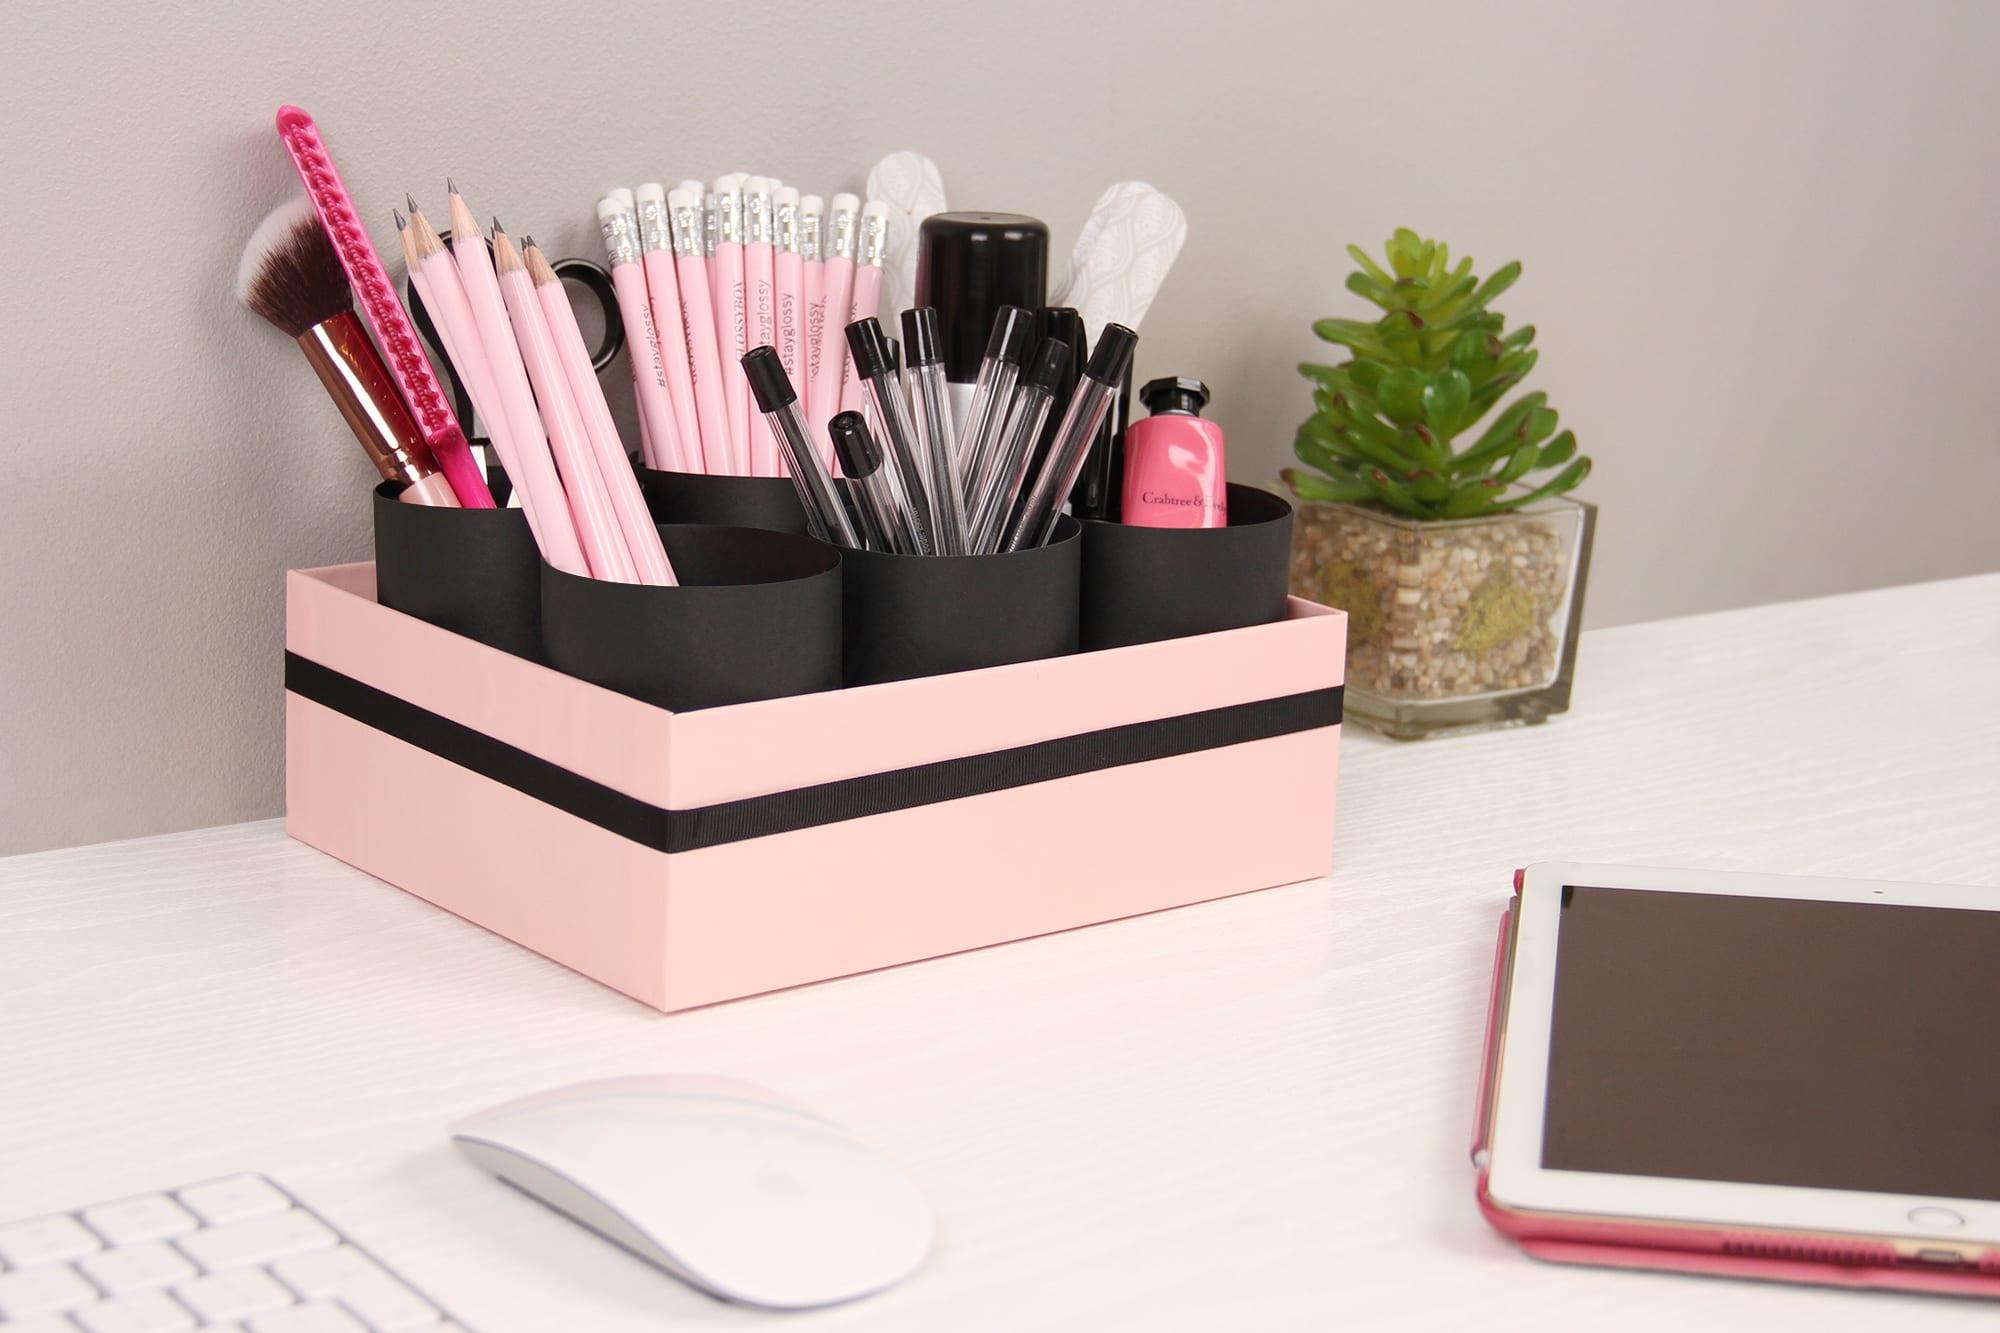 glossybox-box-upscale-desk-organiser